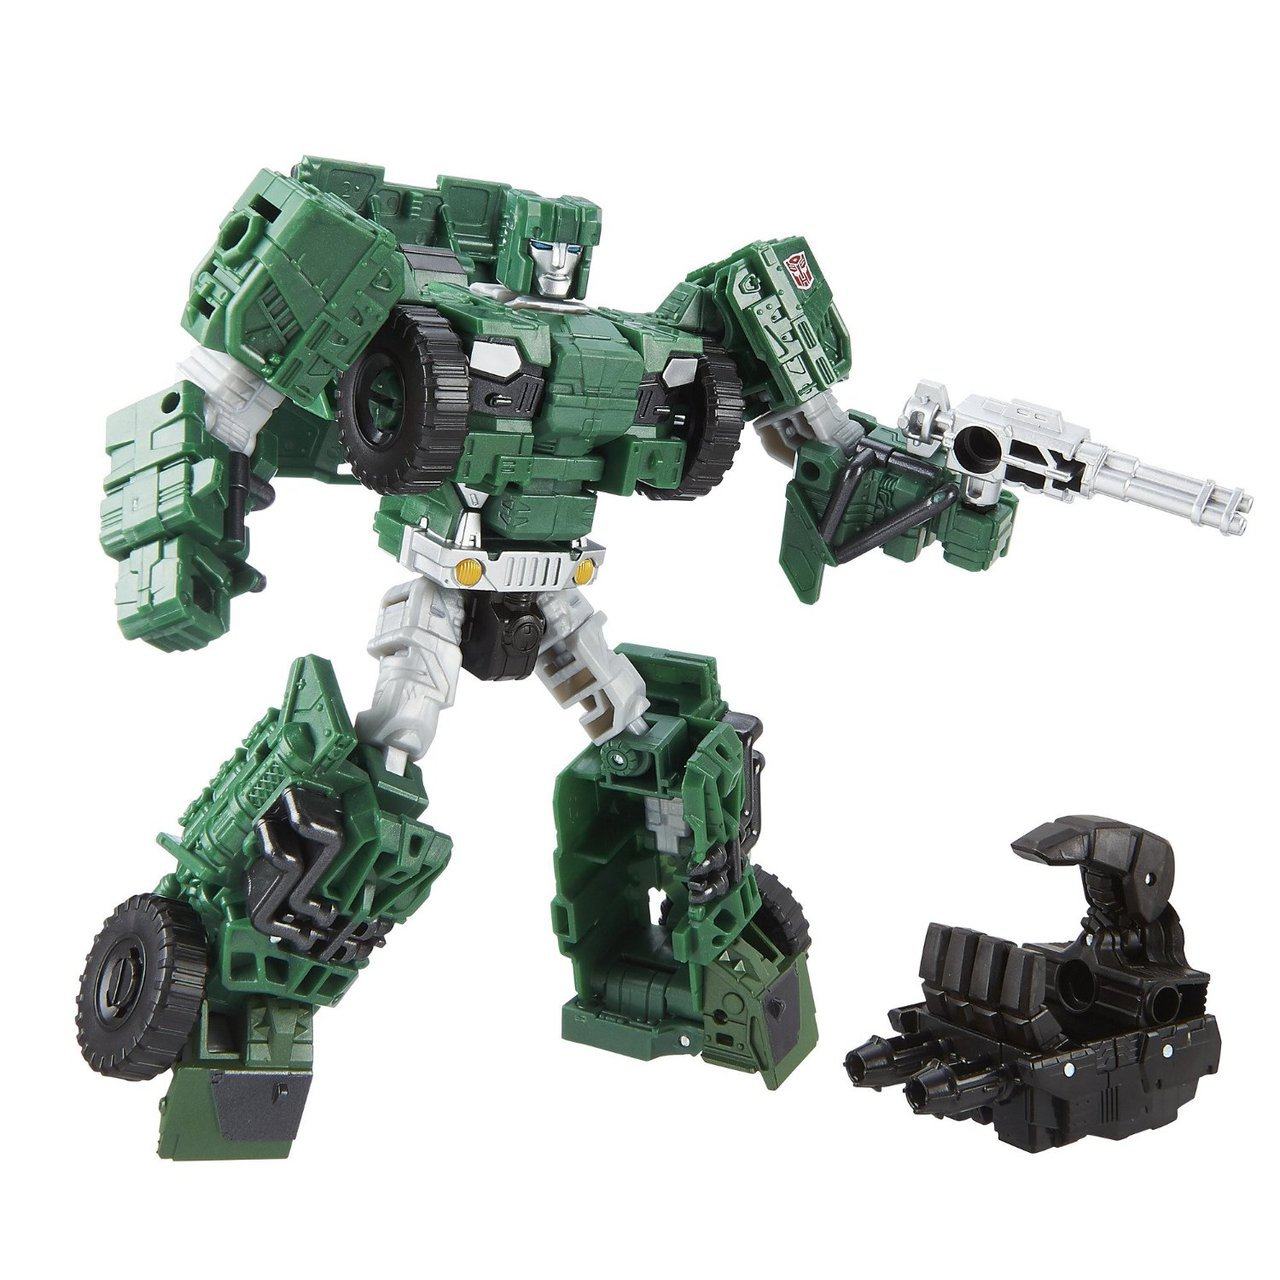 Трансформер класса Делюкс - Autobot HoundИгрушки трансформеры<br>Трансформер класса Делюкс - Autobot Hound<br>